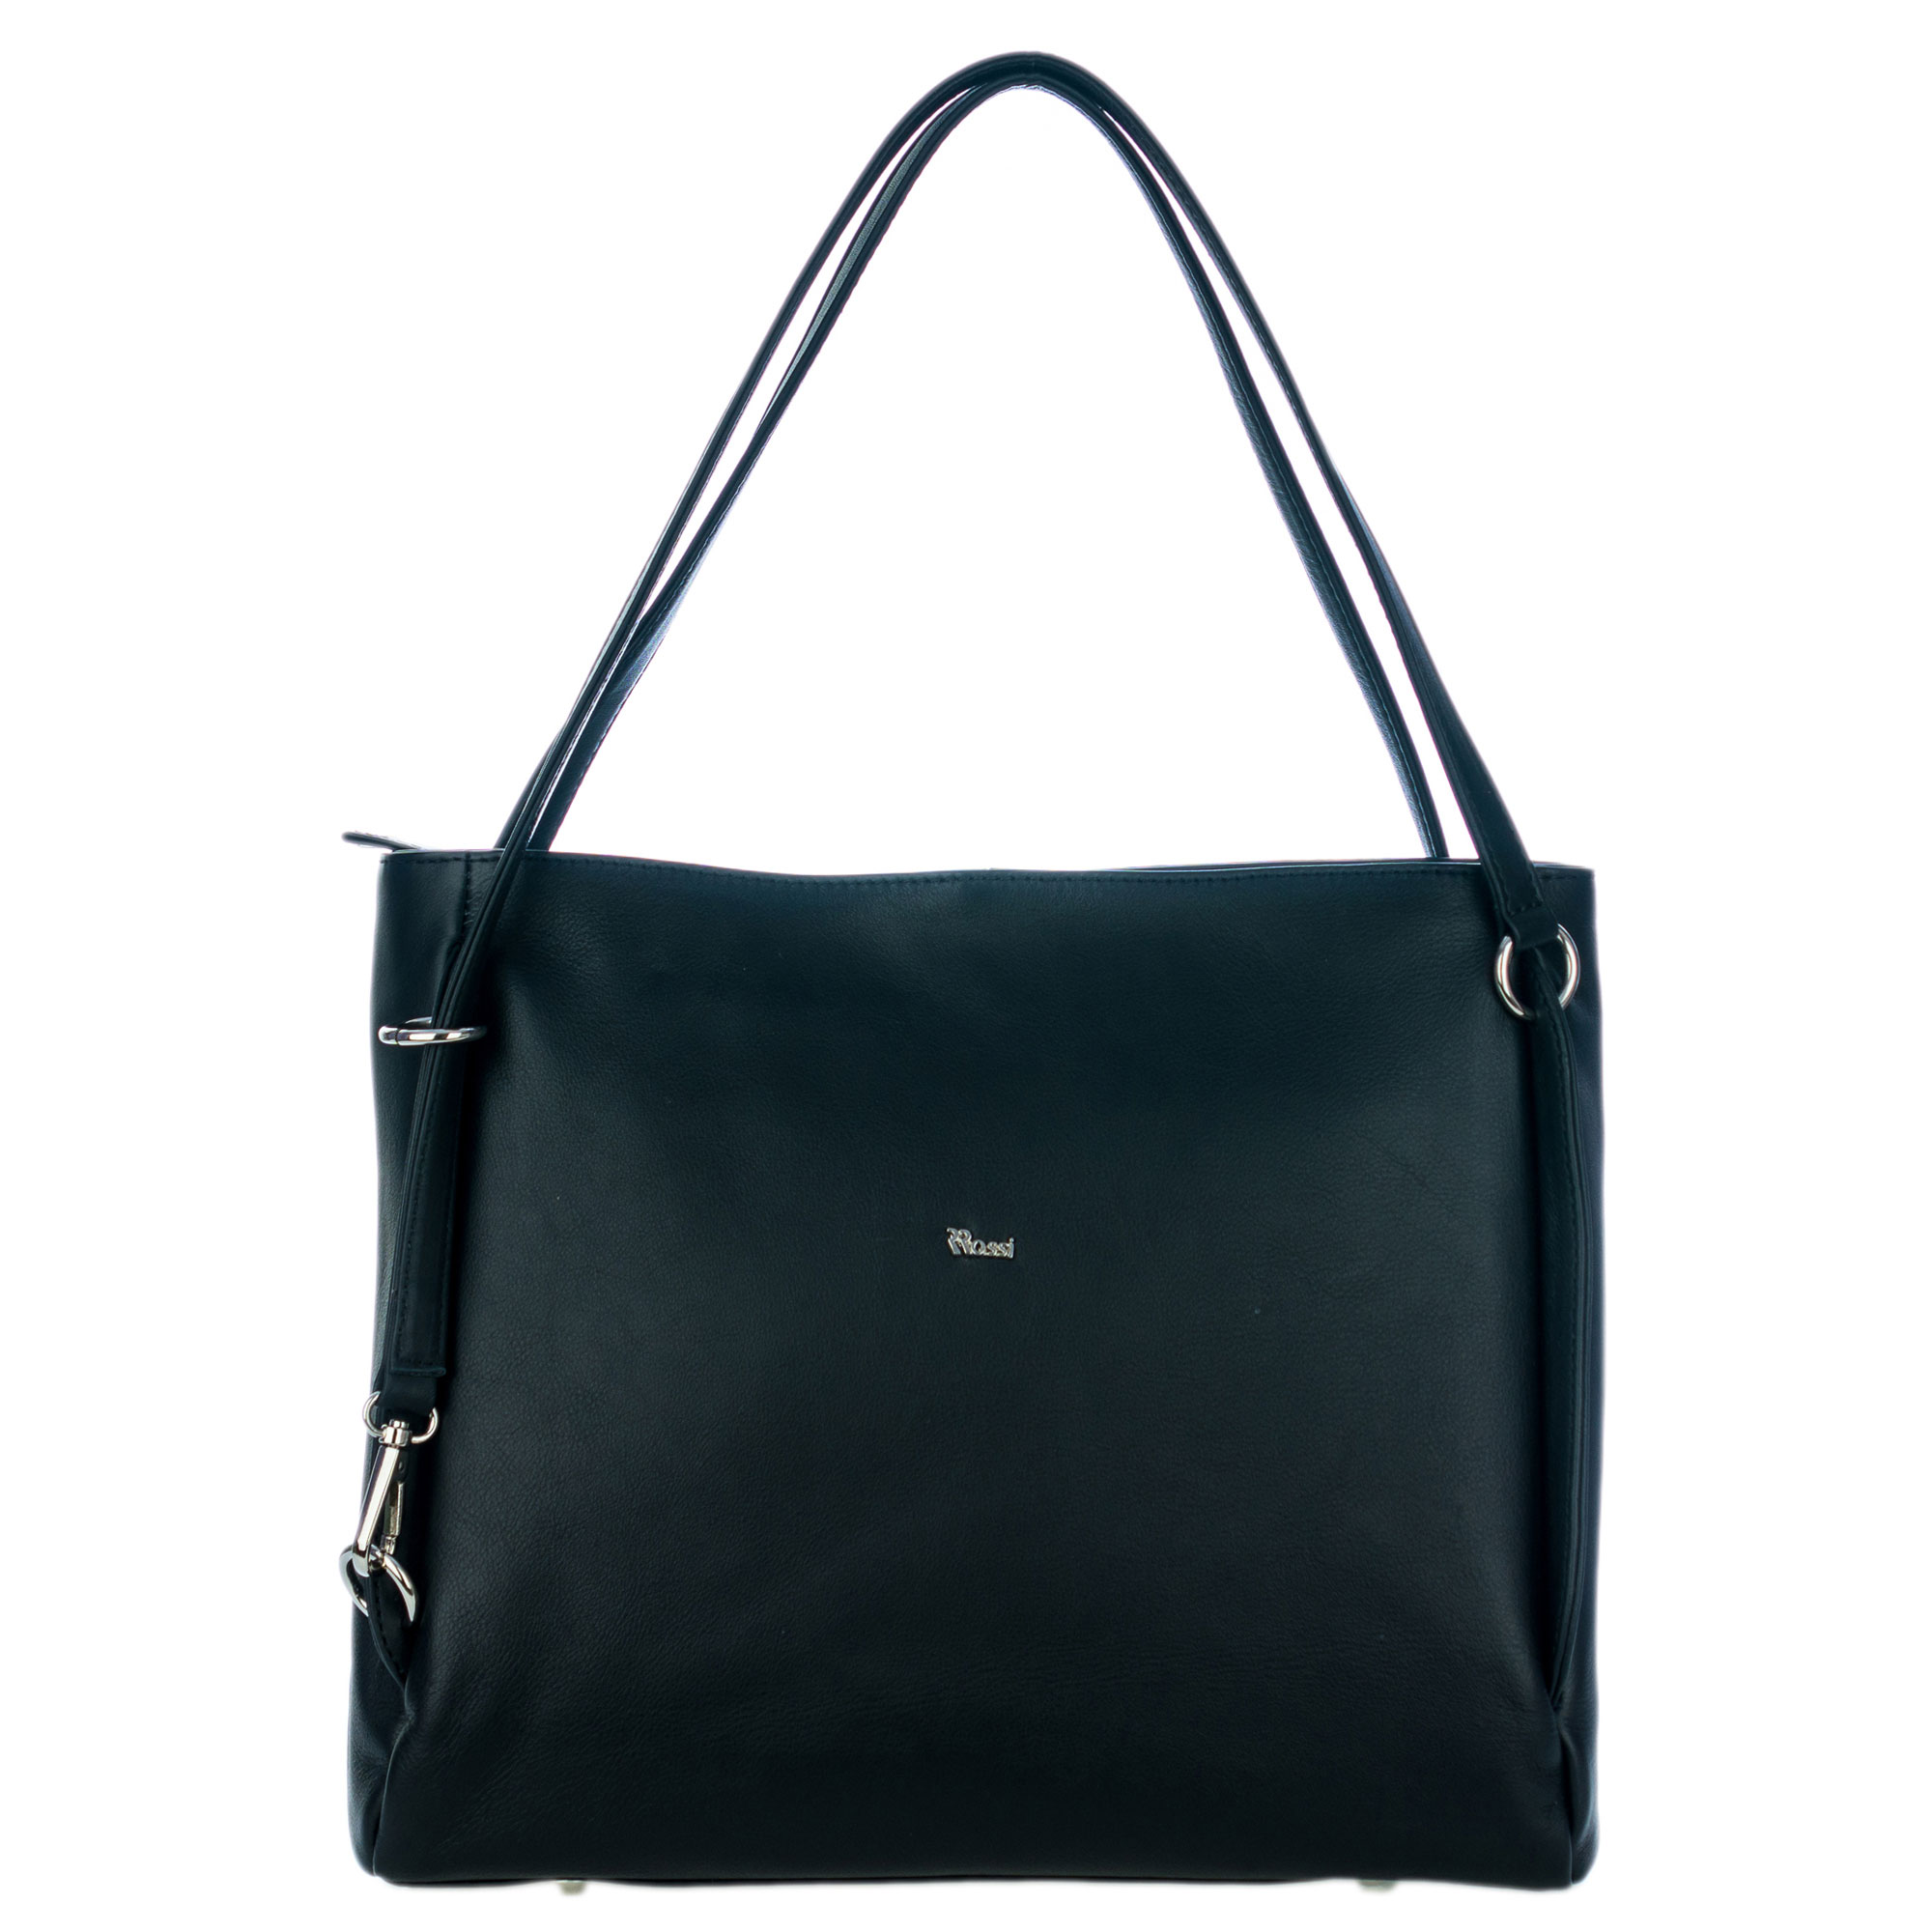 Bruno Rossi Italian Made Black Calf Leather Carryall Tote Bag